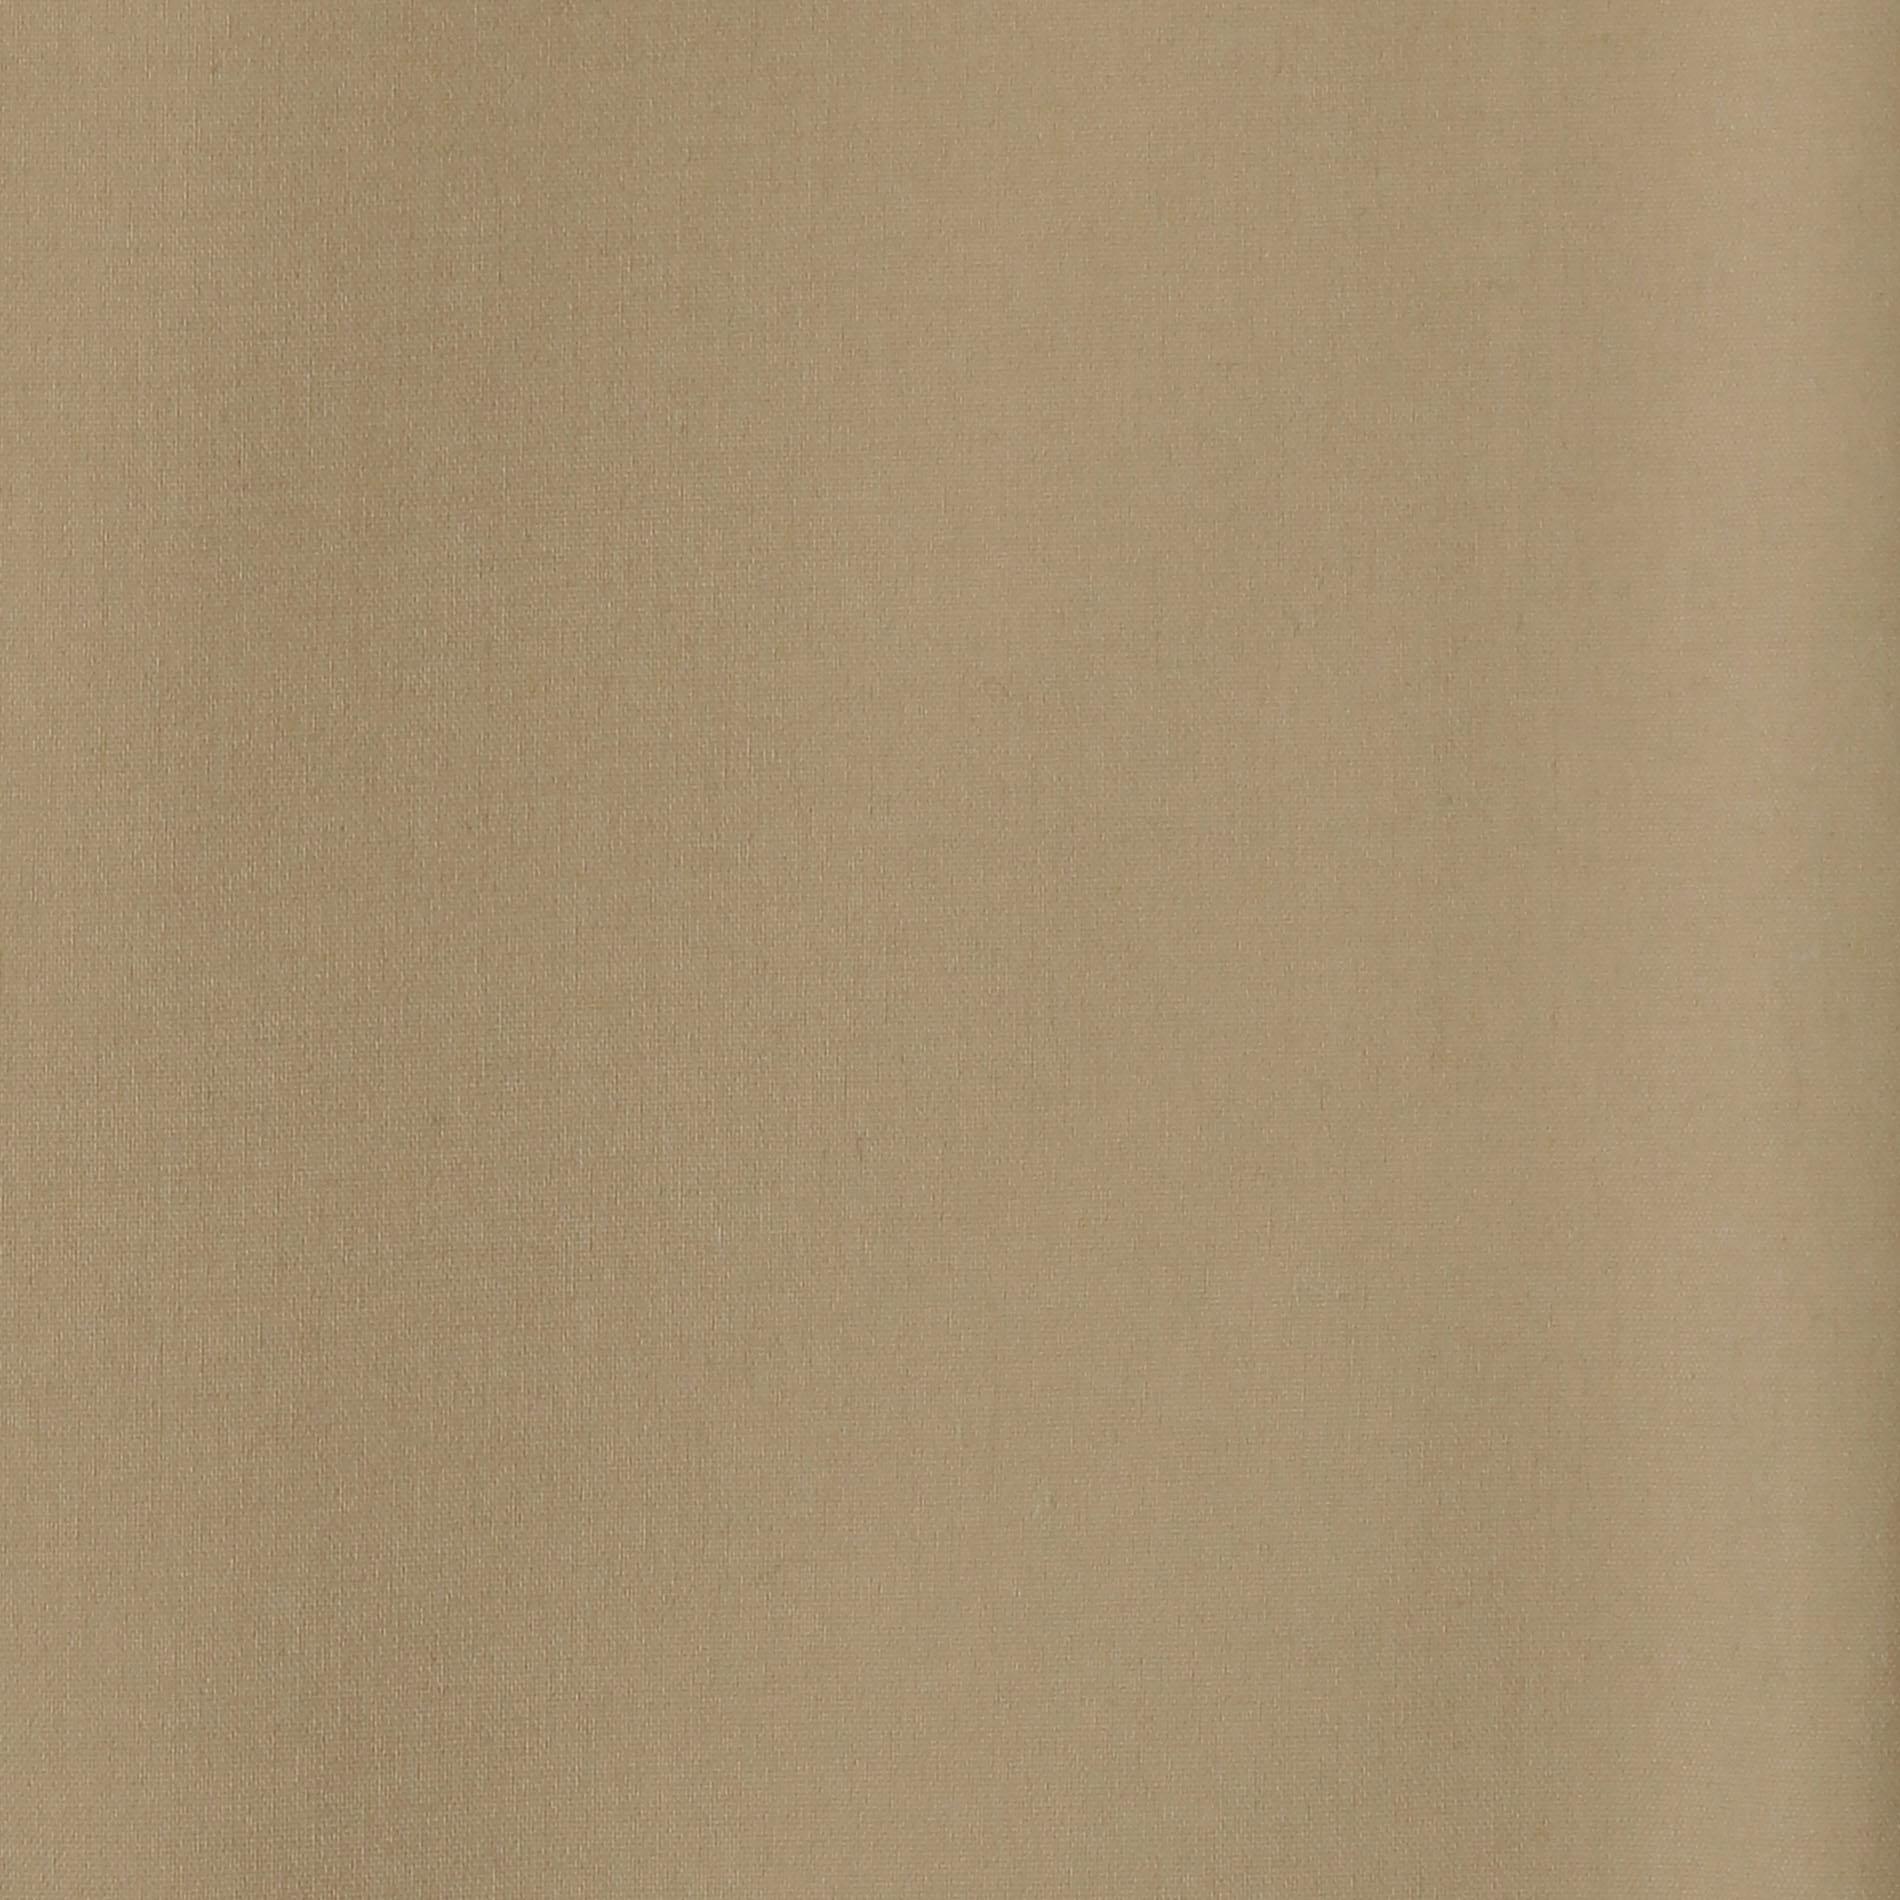 【MACKINTOSH】【ALCAIG】モッズ風コート